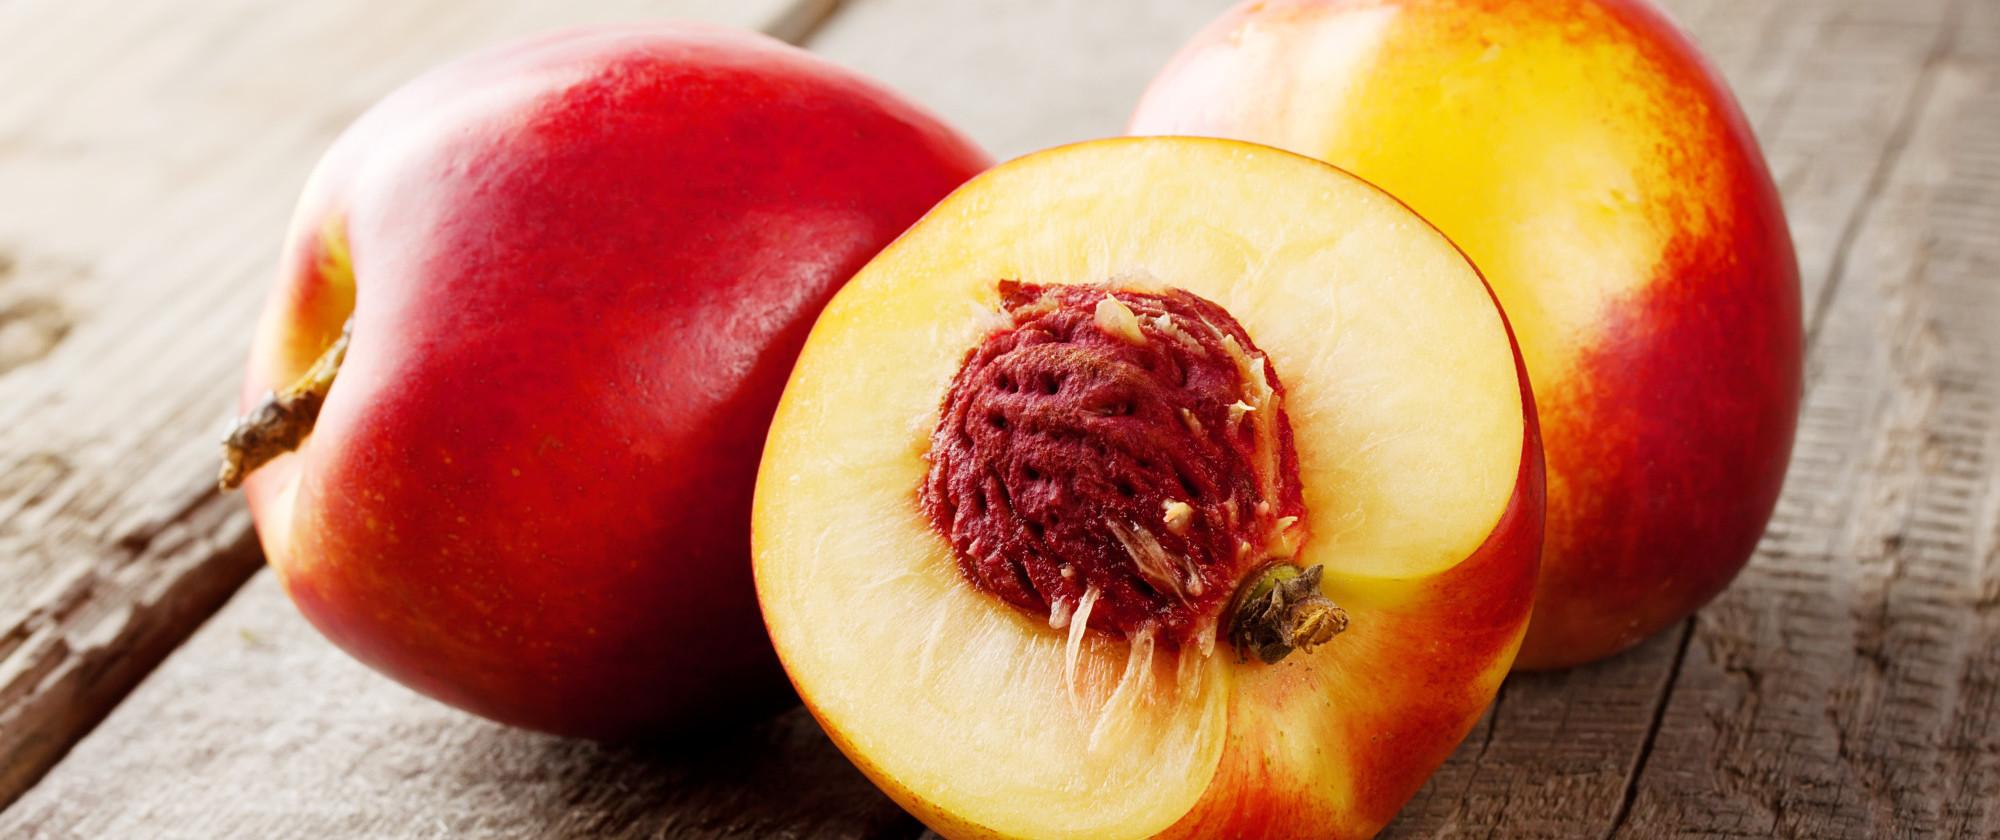 La nectarine cebon - Peche a peau lisse ...